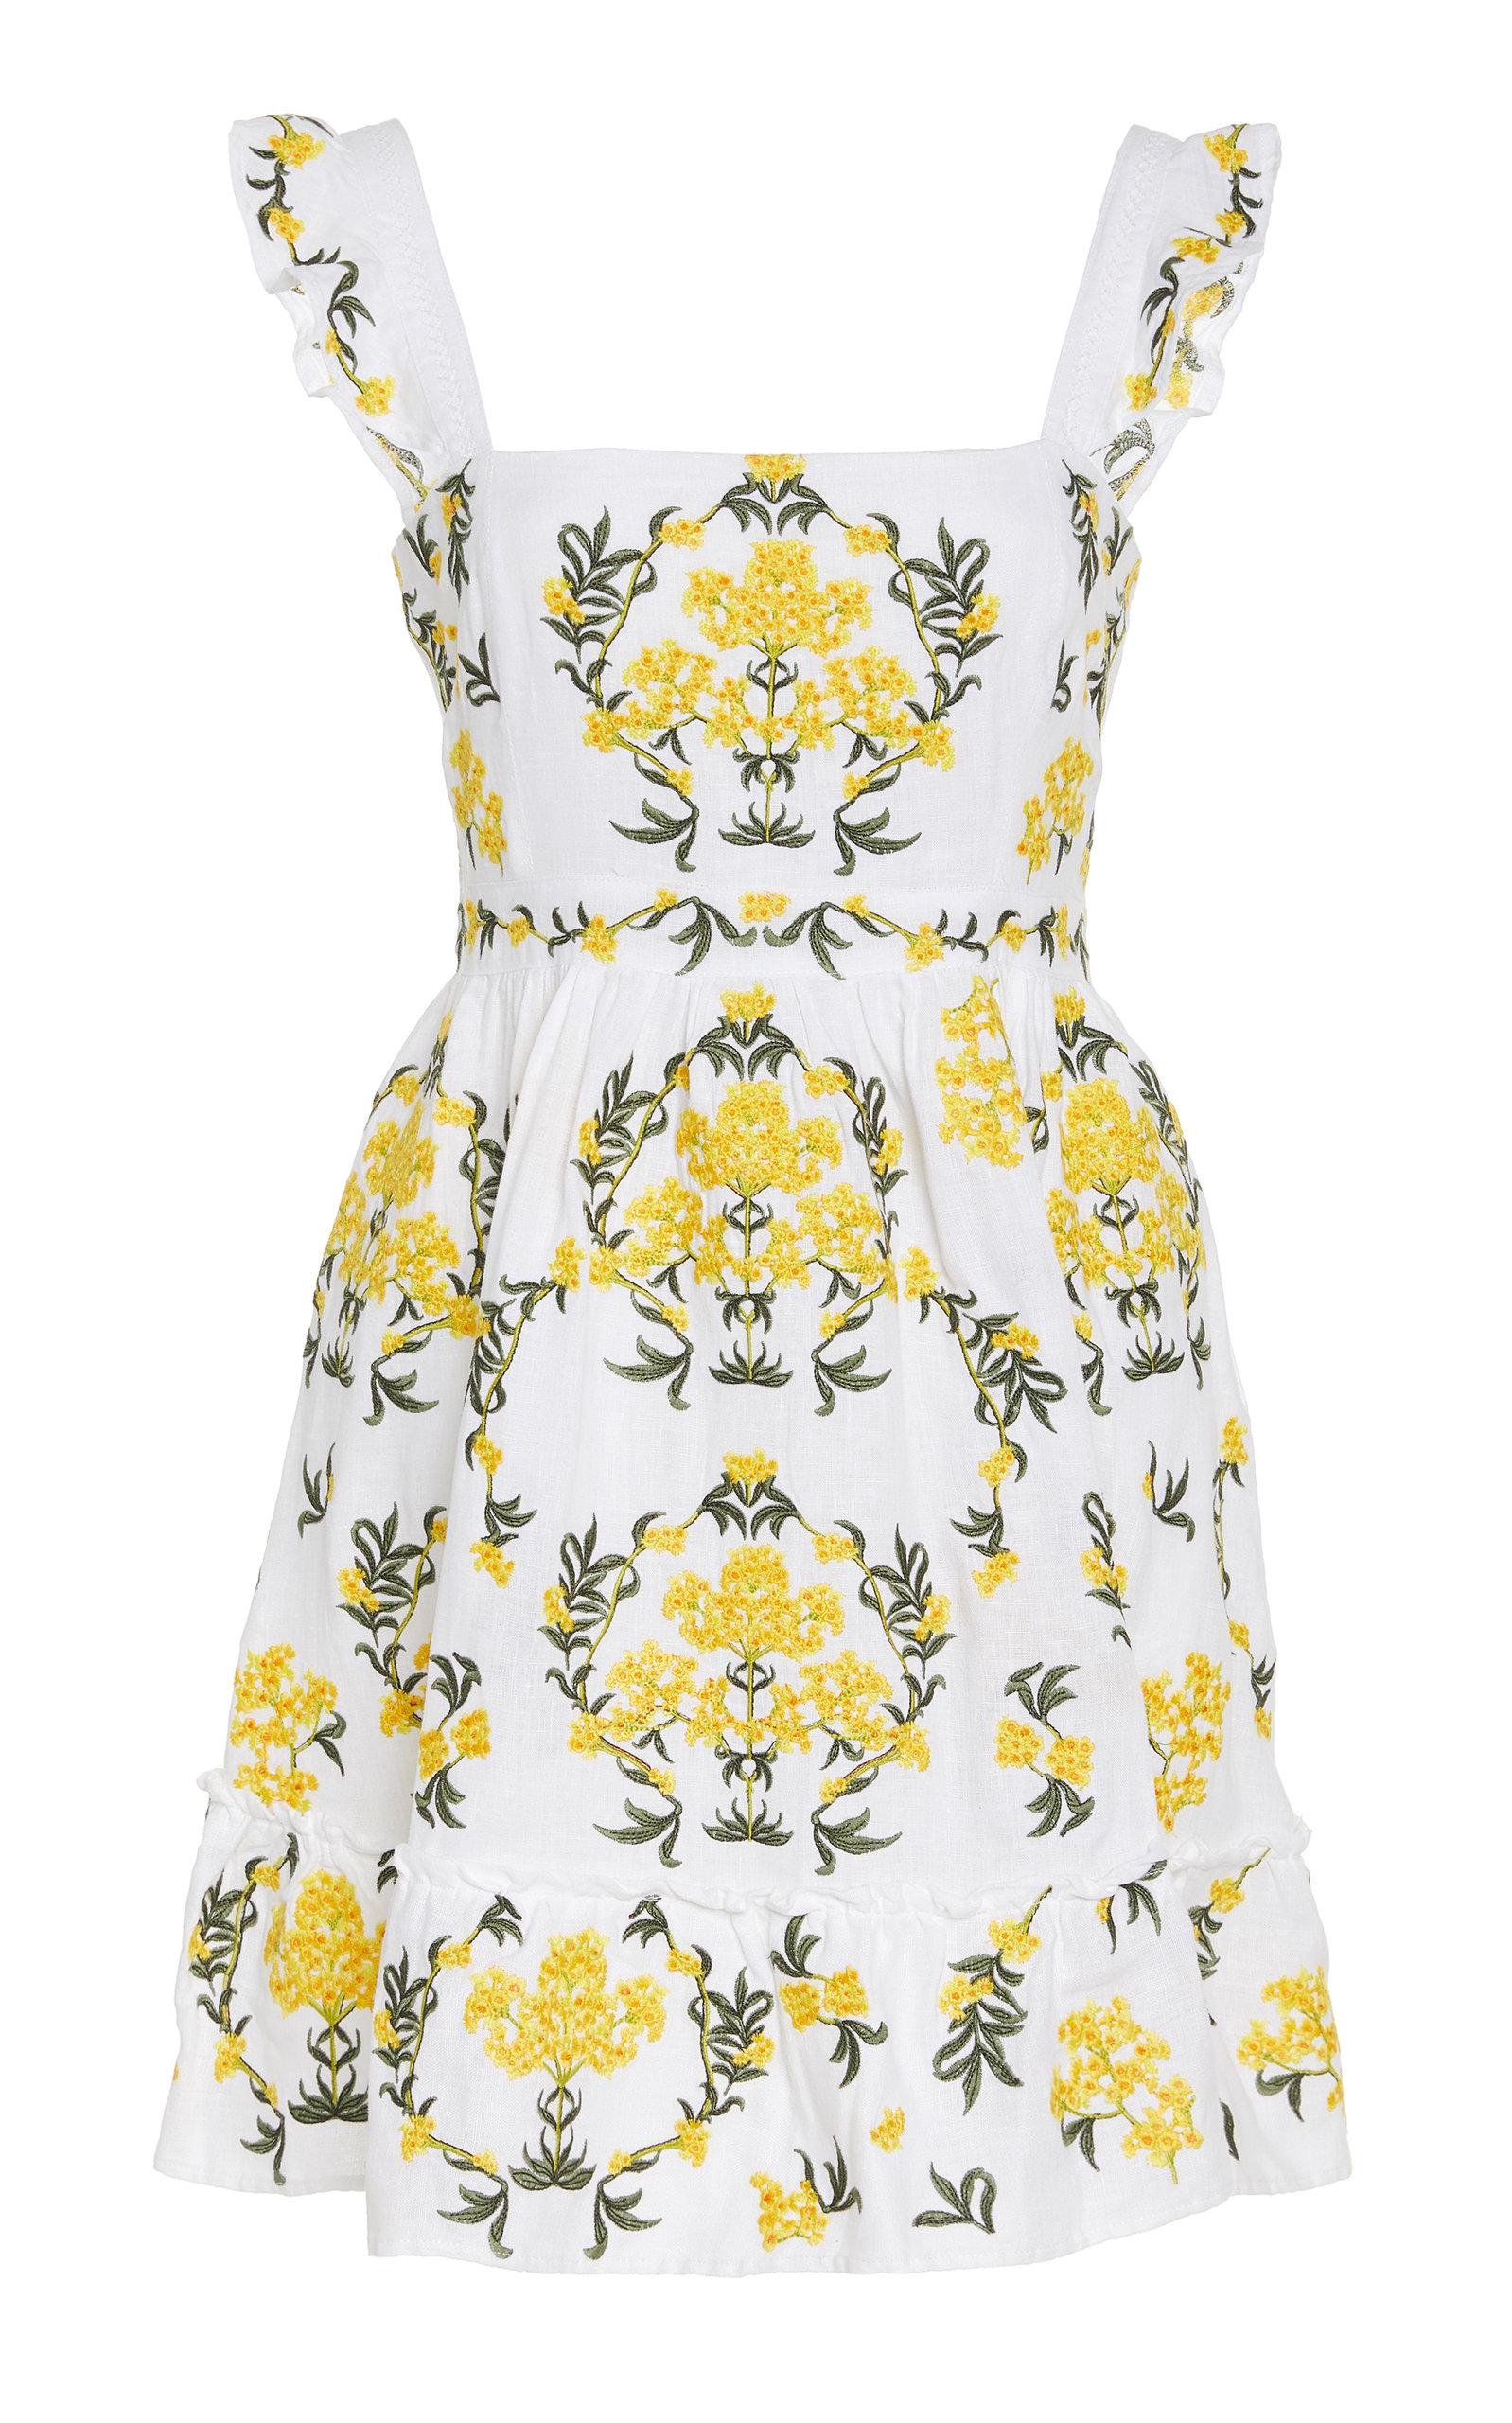 Buy Agua by Agua Bendita Herbarium Embroidered Linen Mini Dress online, shop Agua by Agua Bendita at the best price